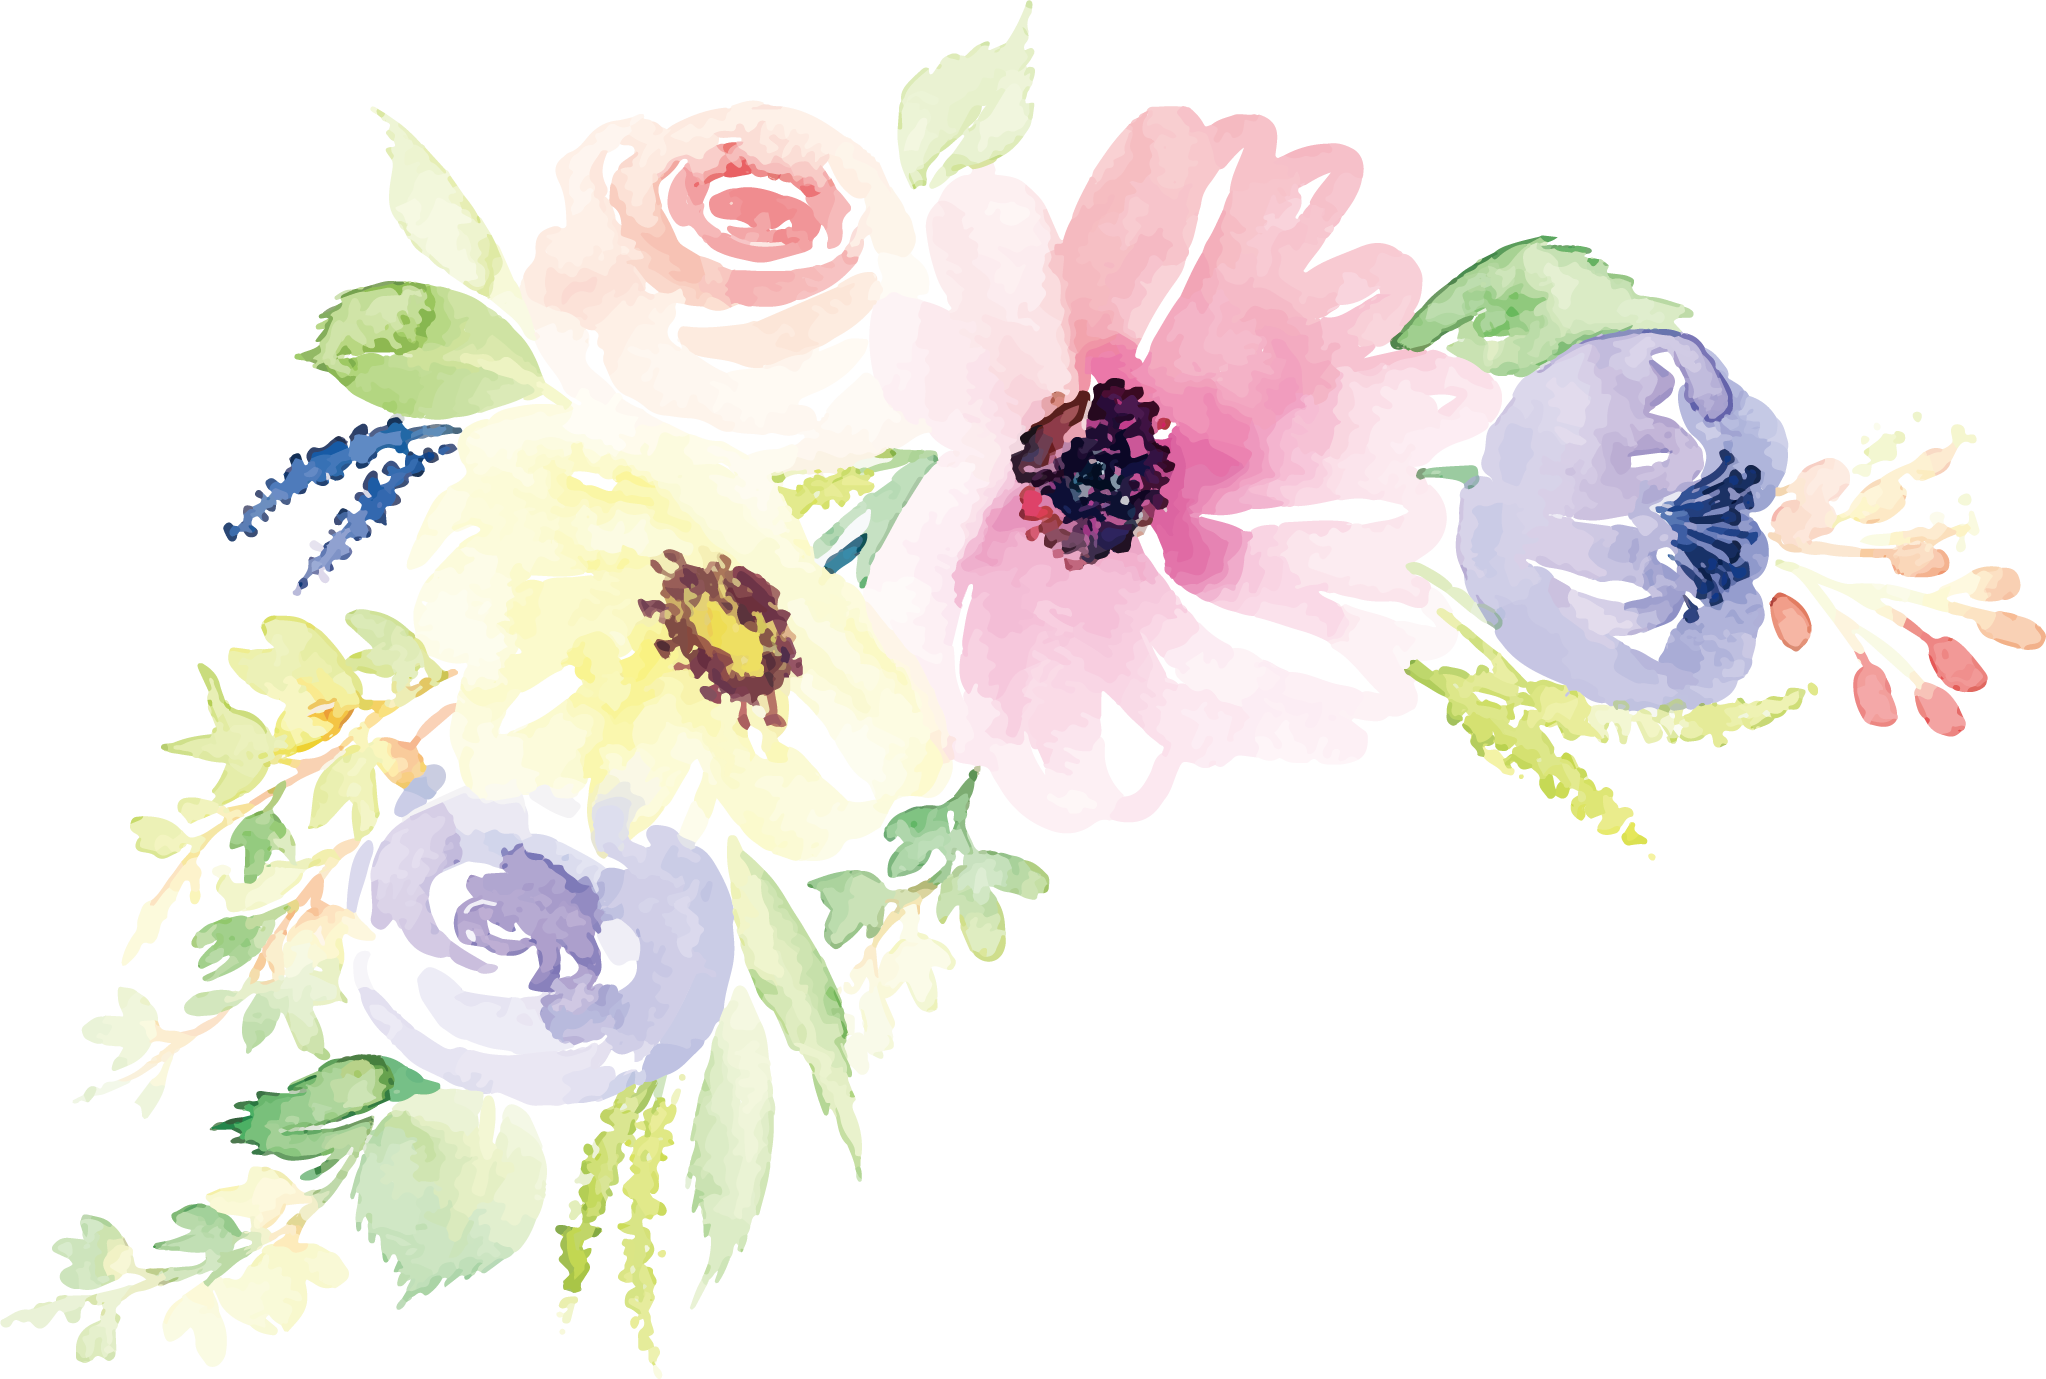 Floral Design Watercolor Painting Flower Illustration